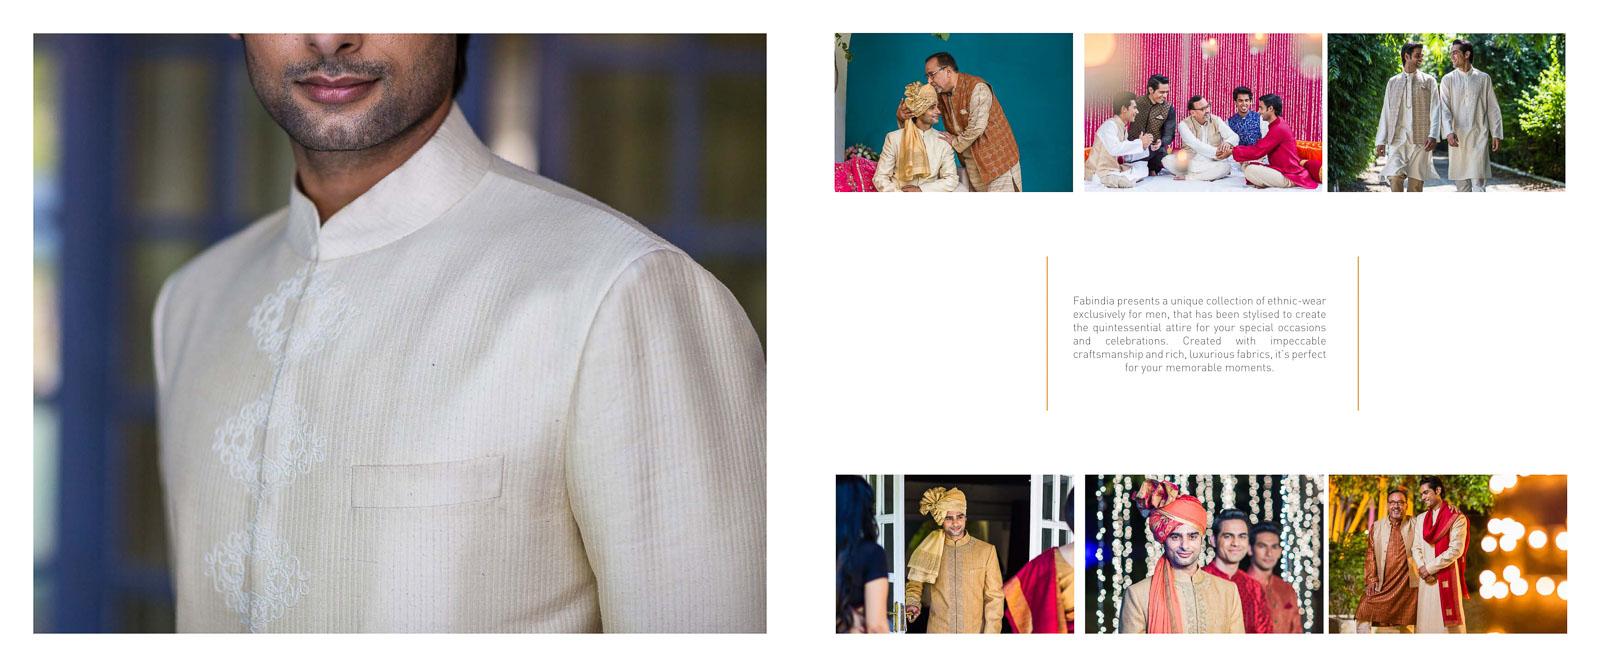 Fashion-Photographer-Fabindia-Ethnic-RamitBatra_03